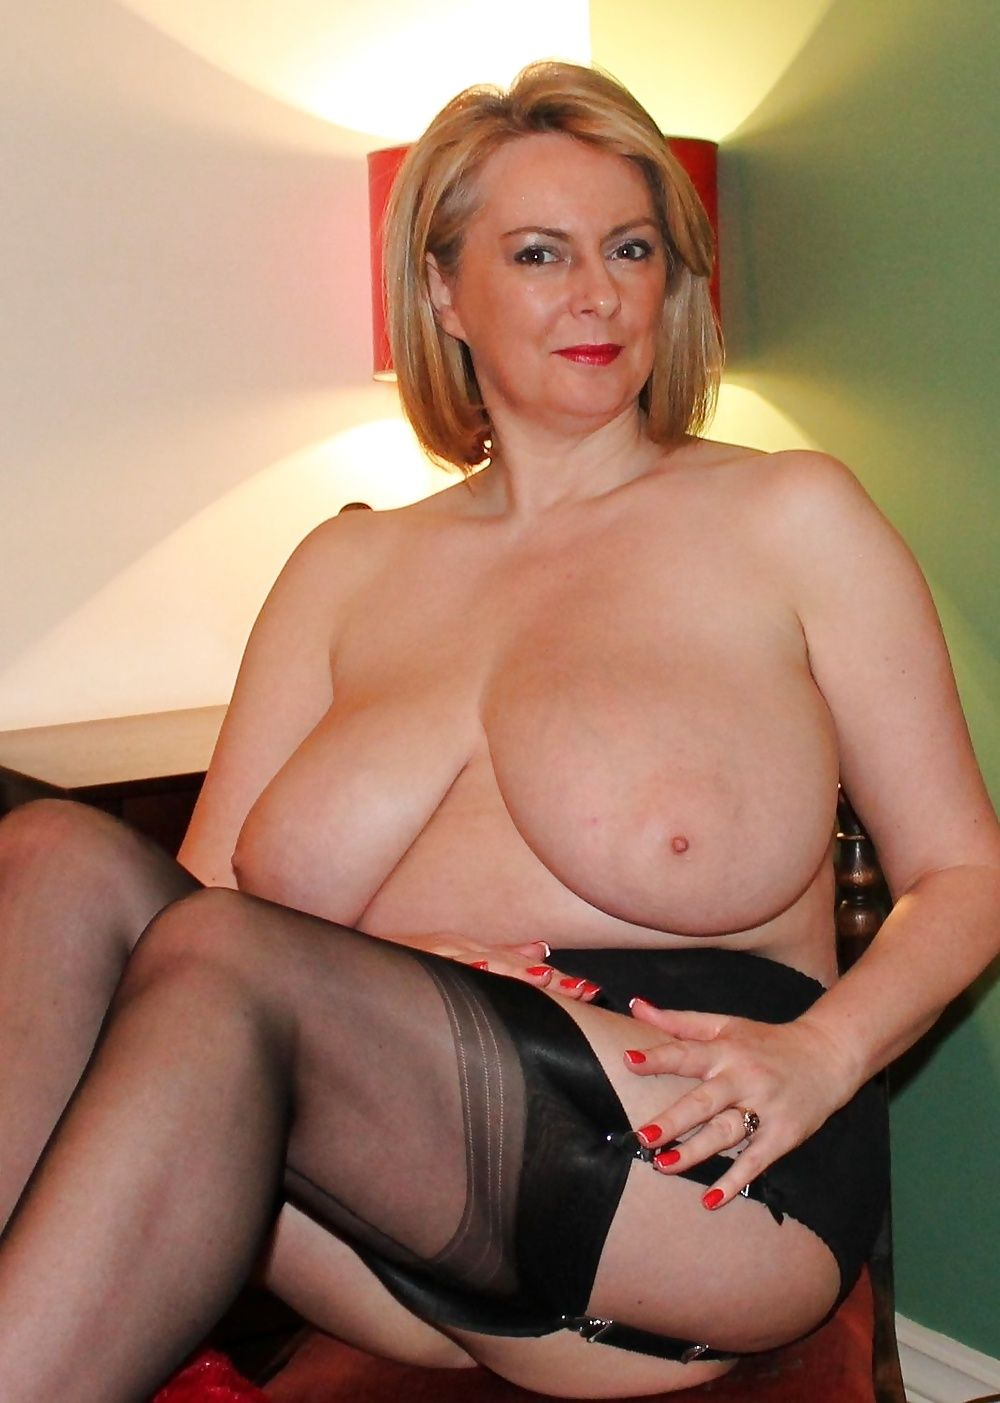 Picture sexy mature boobs photos montreal men